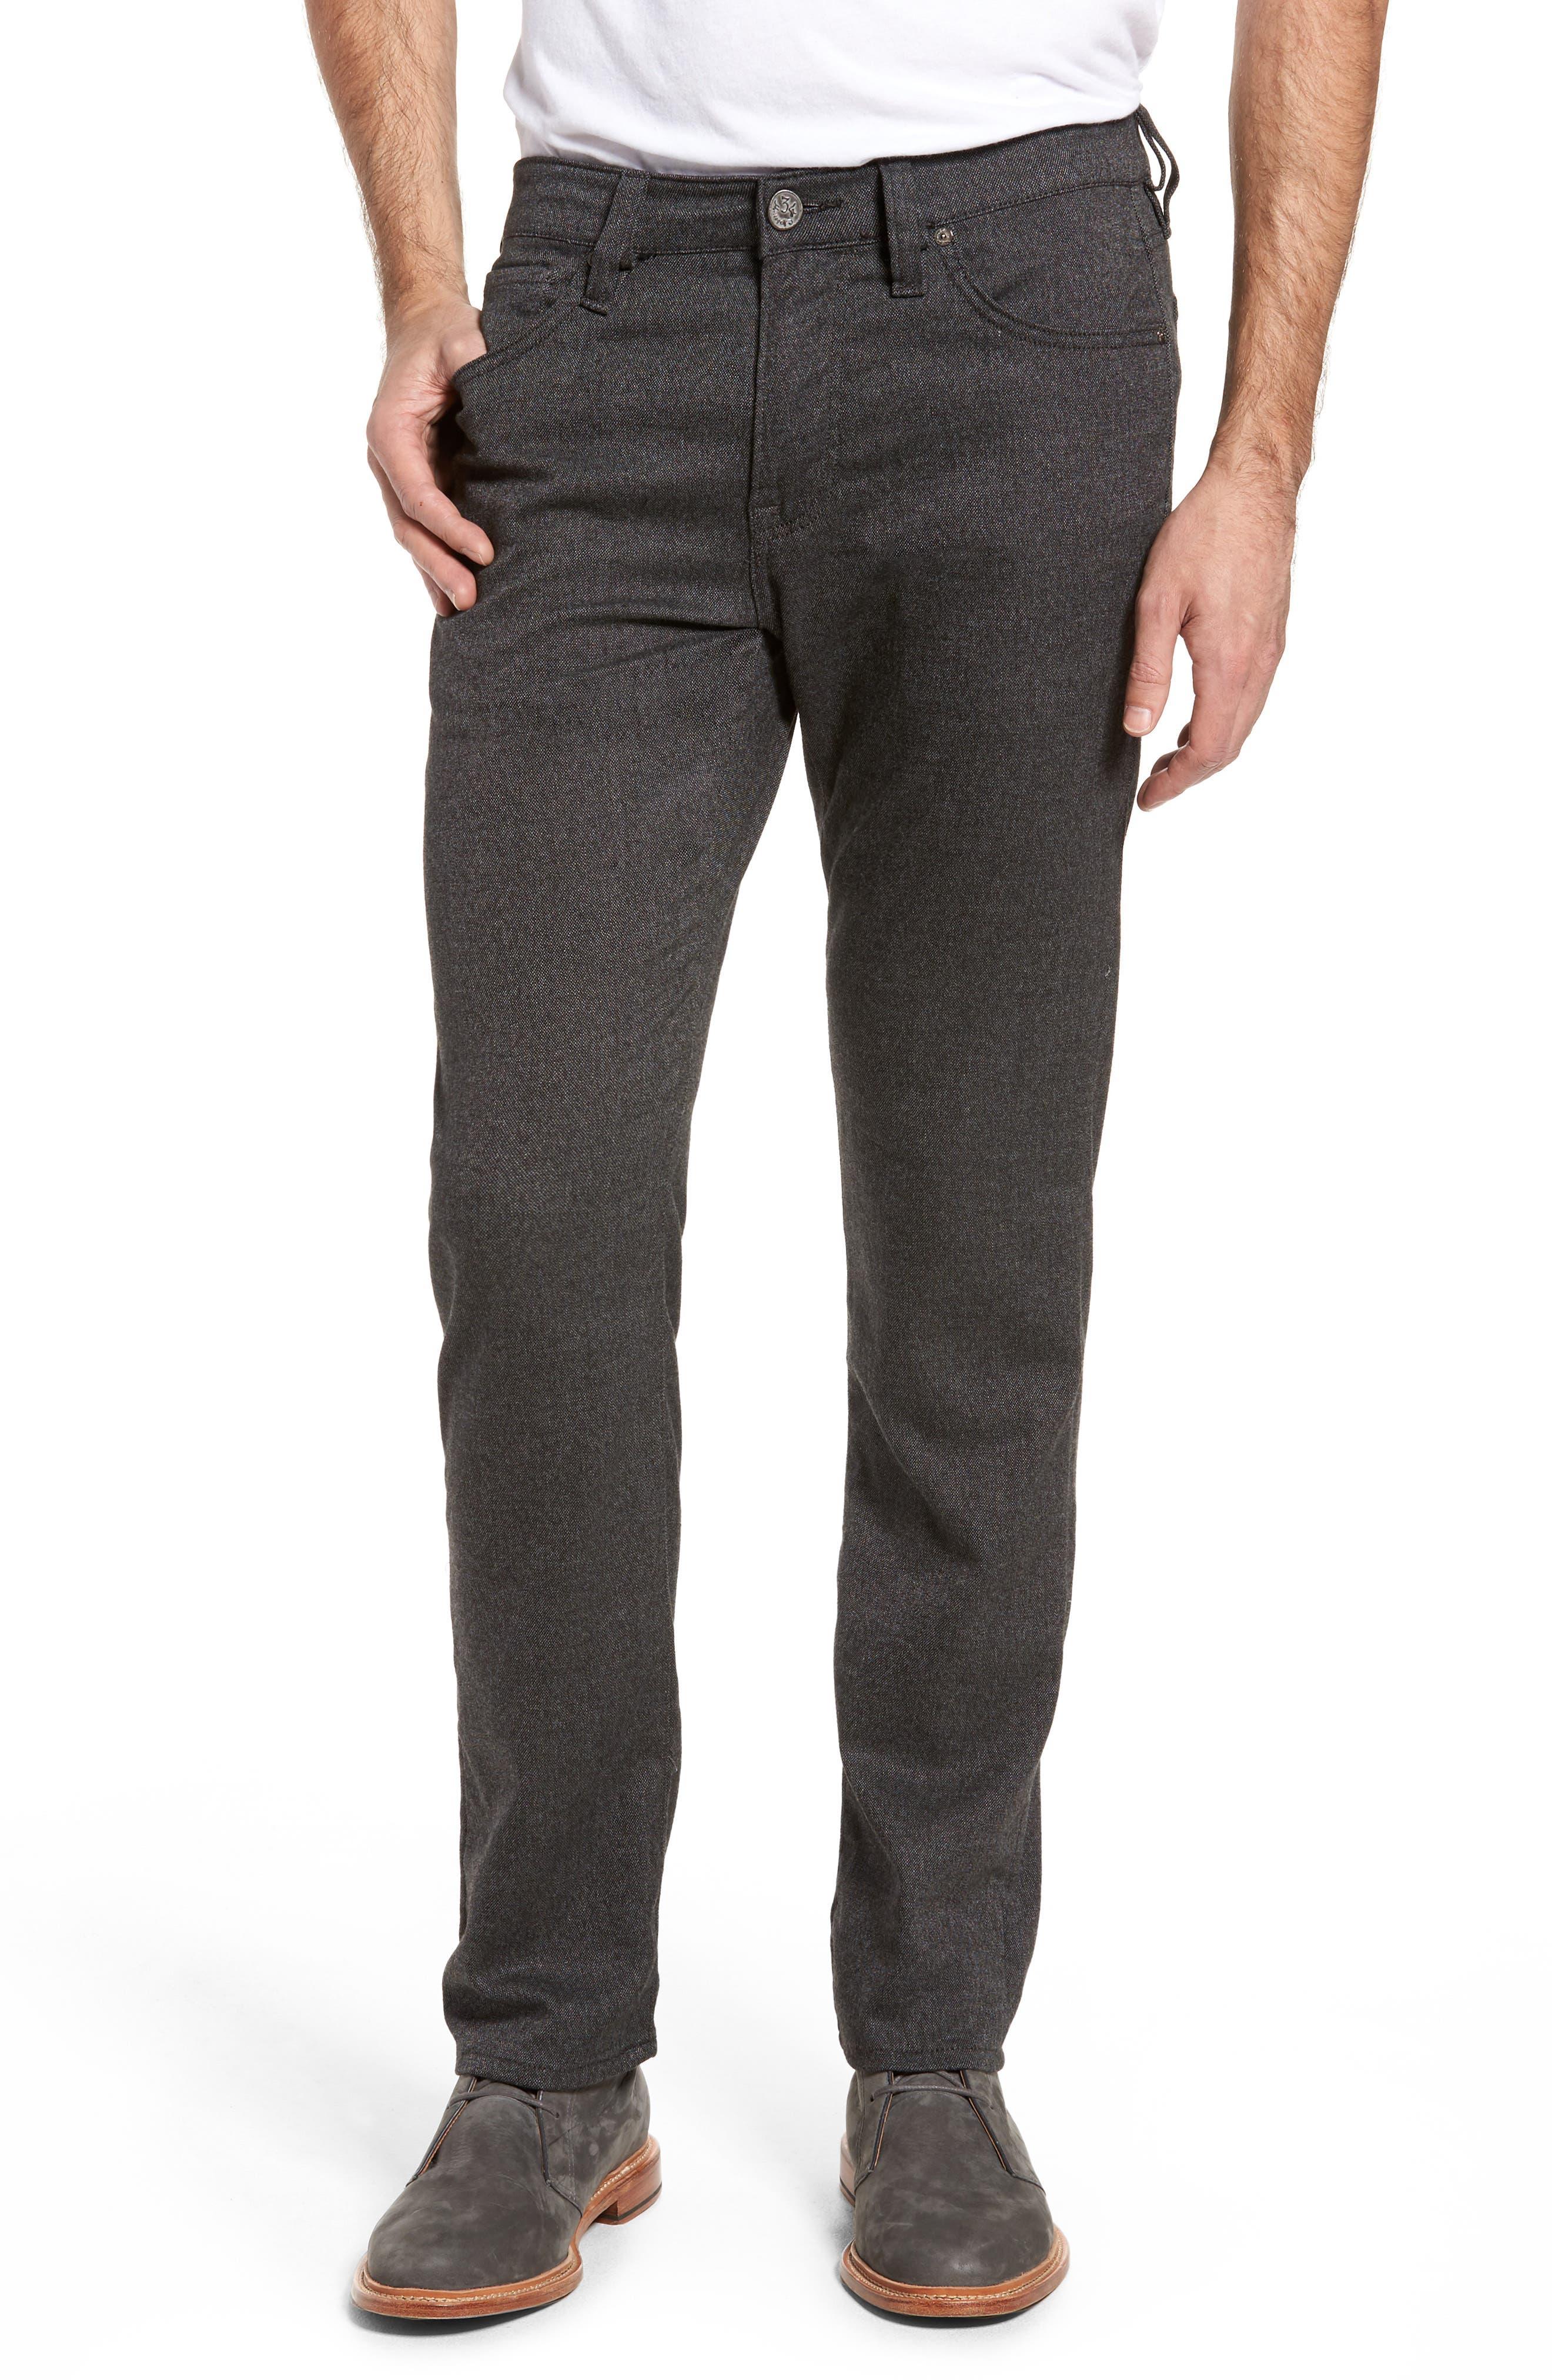 Courage Straight Leg Tweed Pants,                         Main,                         color, Grey Feather Tweed